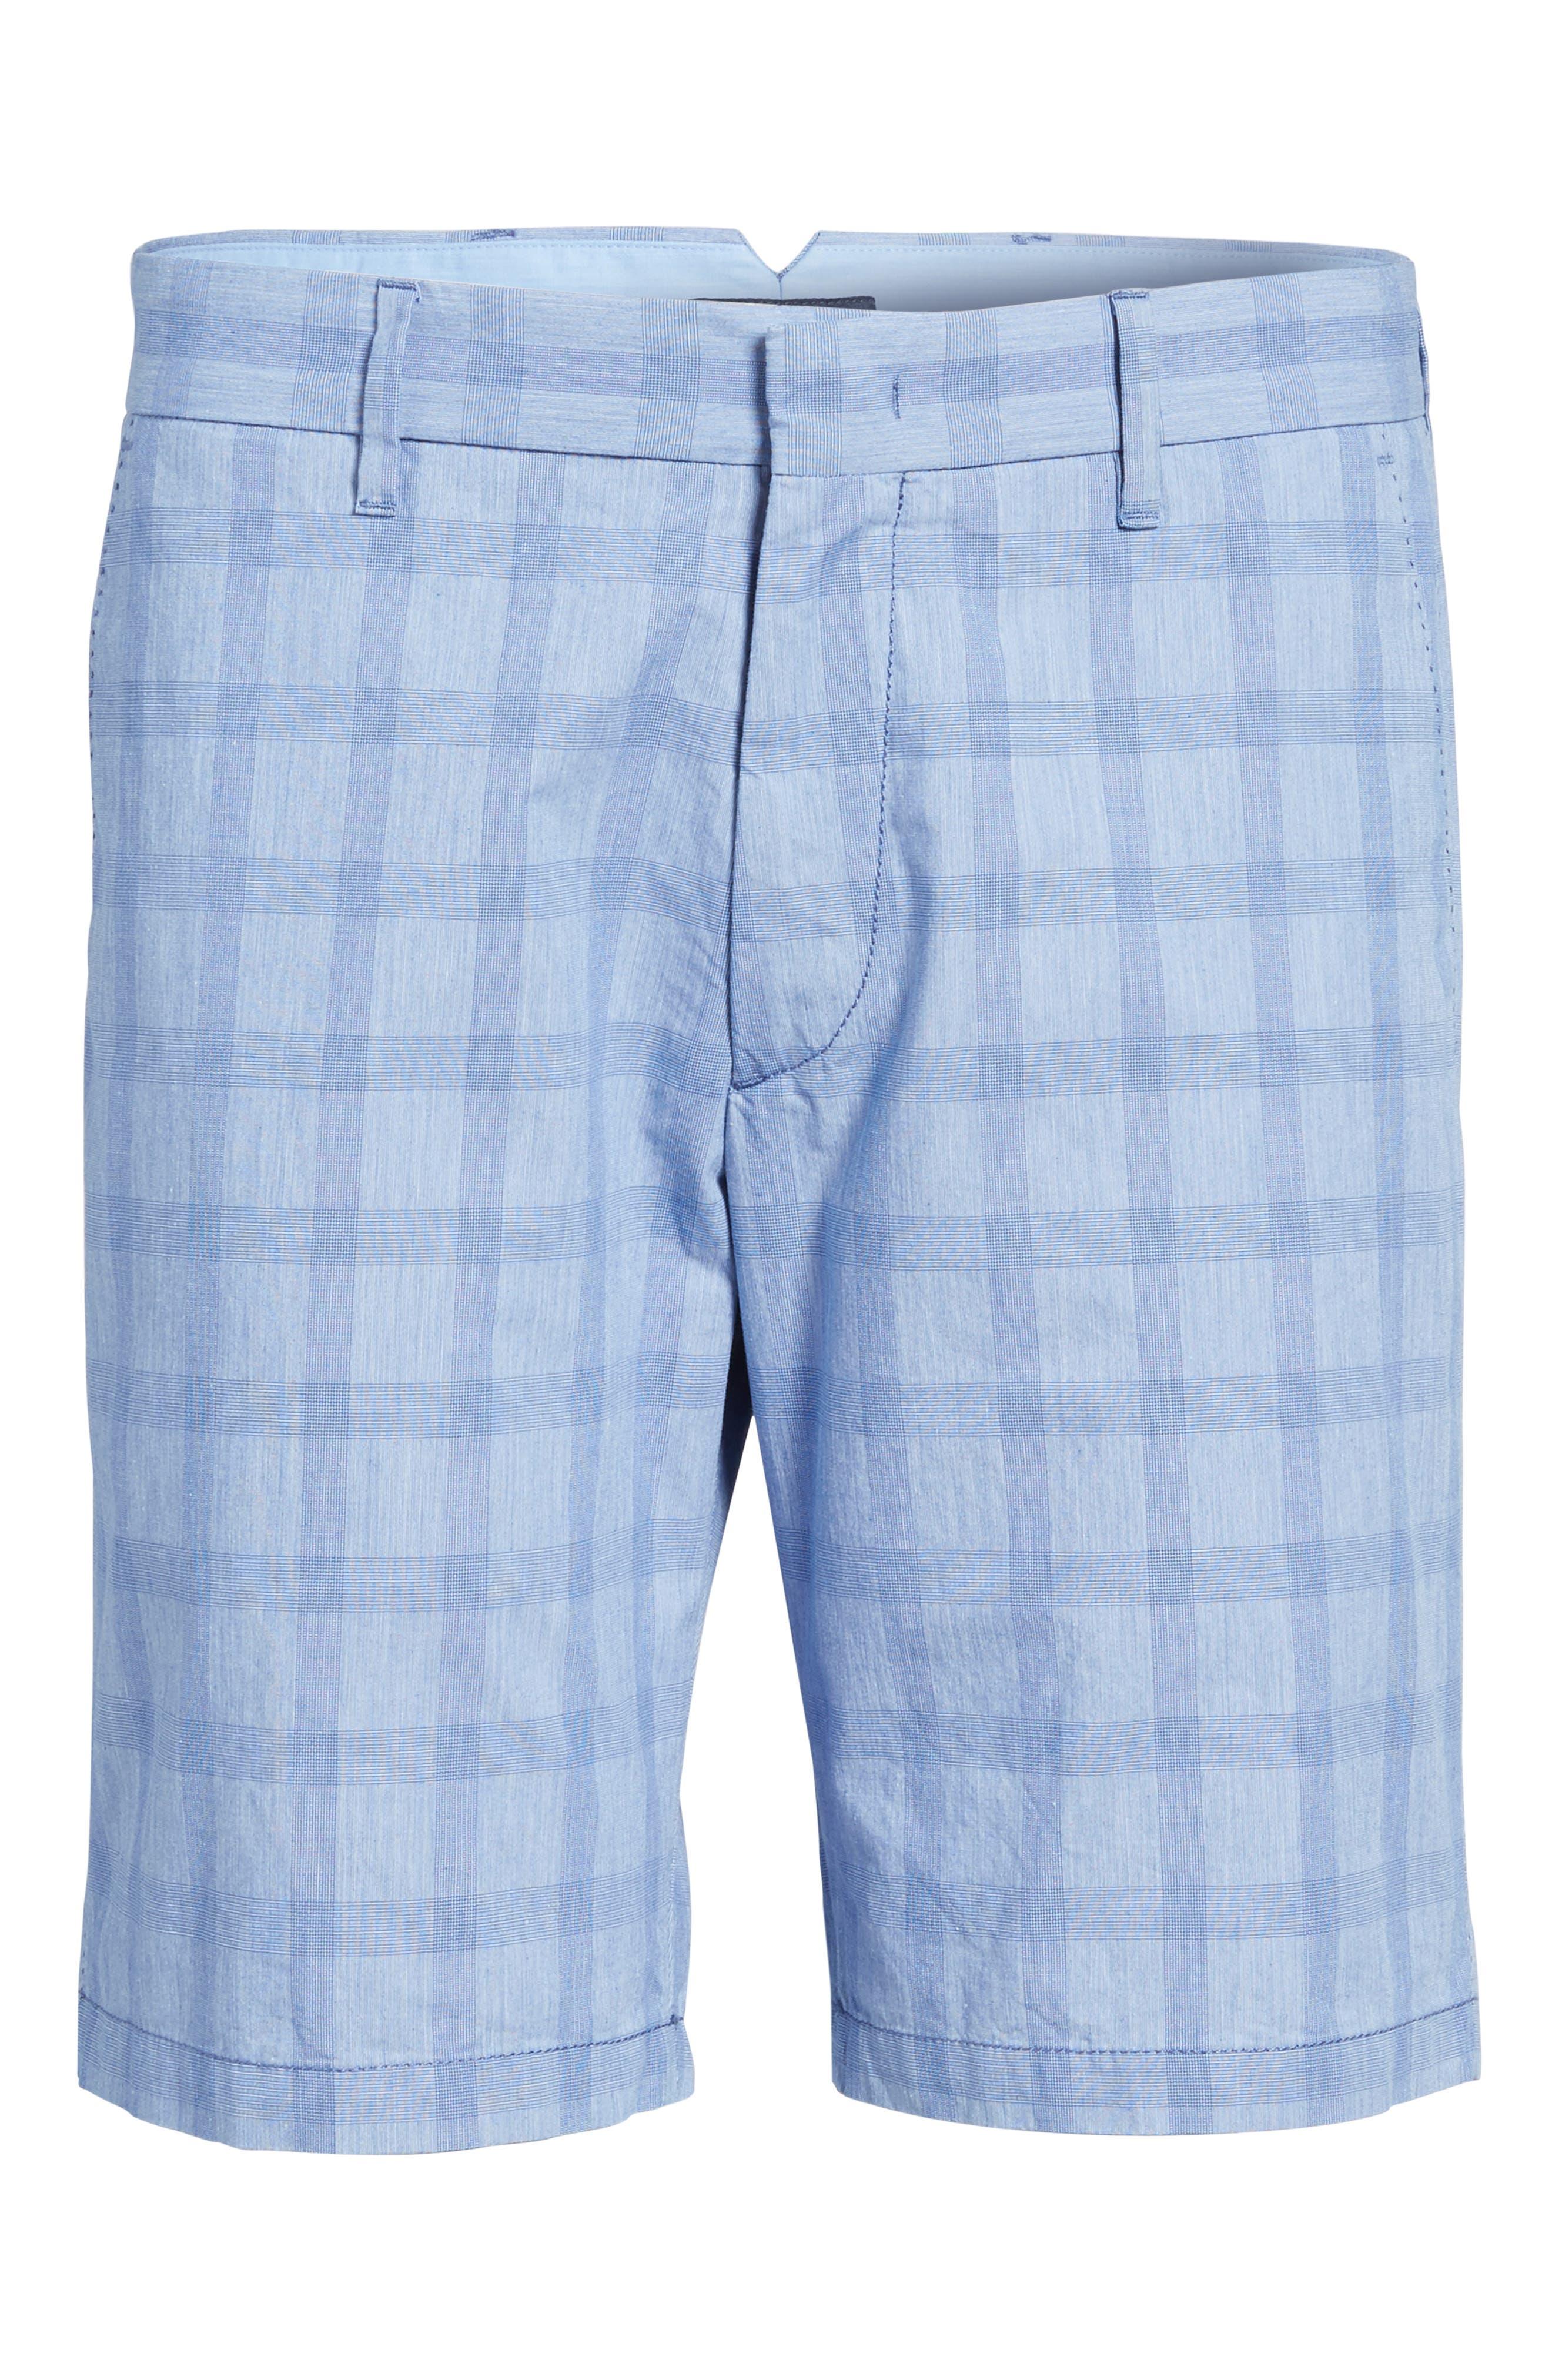 Antrorse Plaid Shorts,                             Alternate thumbnail 6, color,                             400